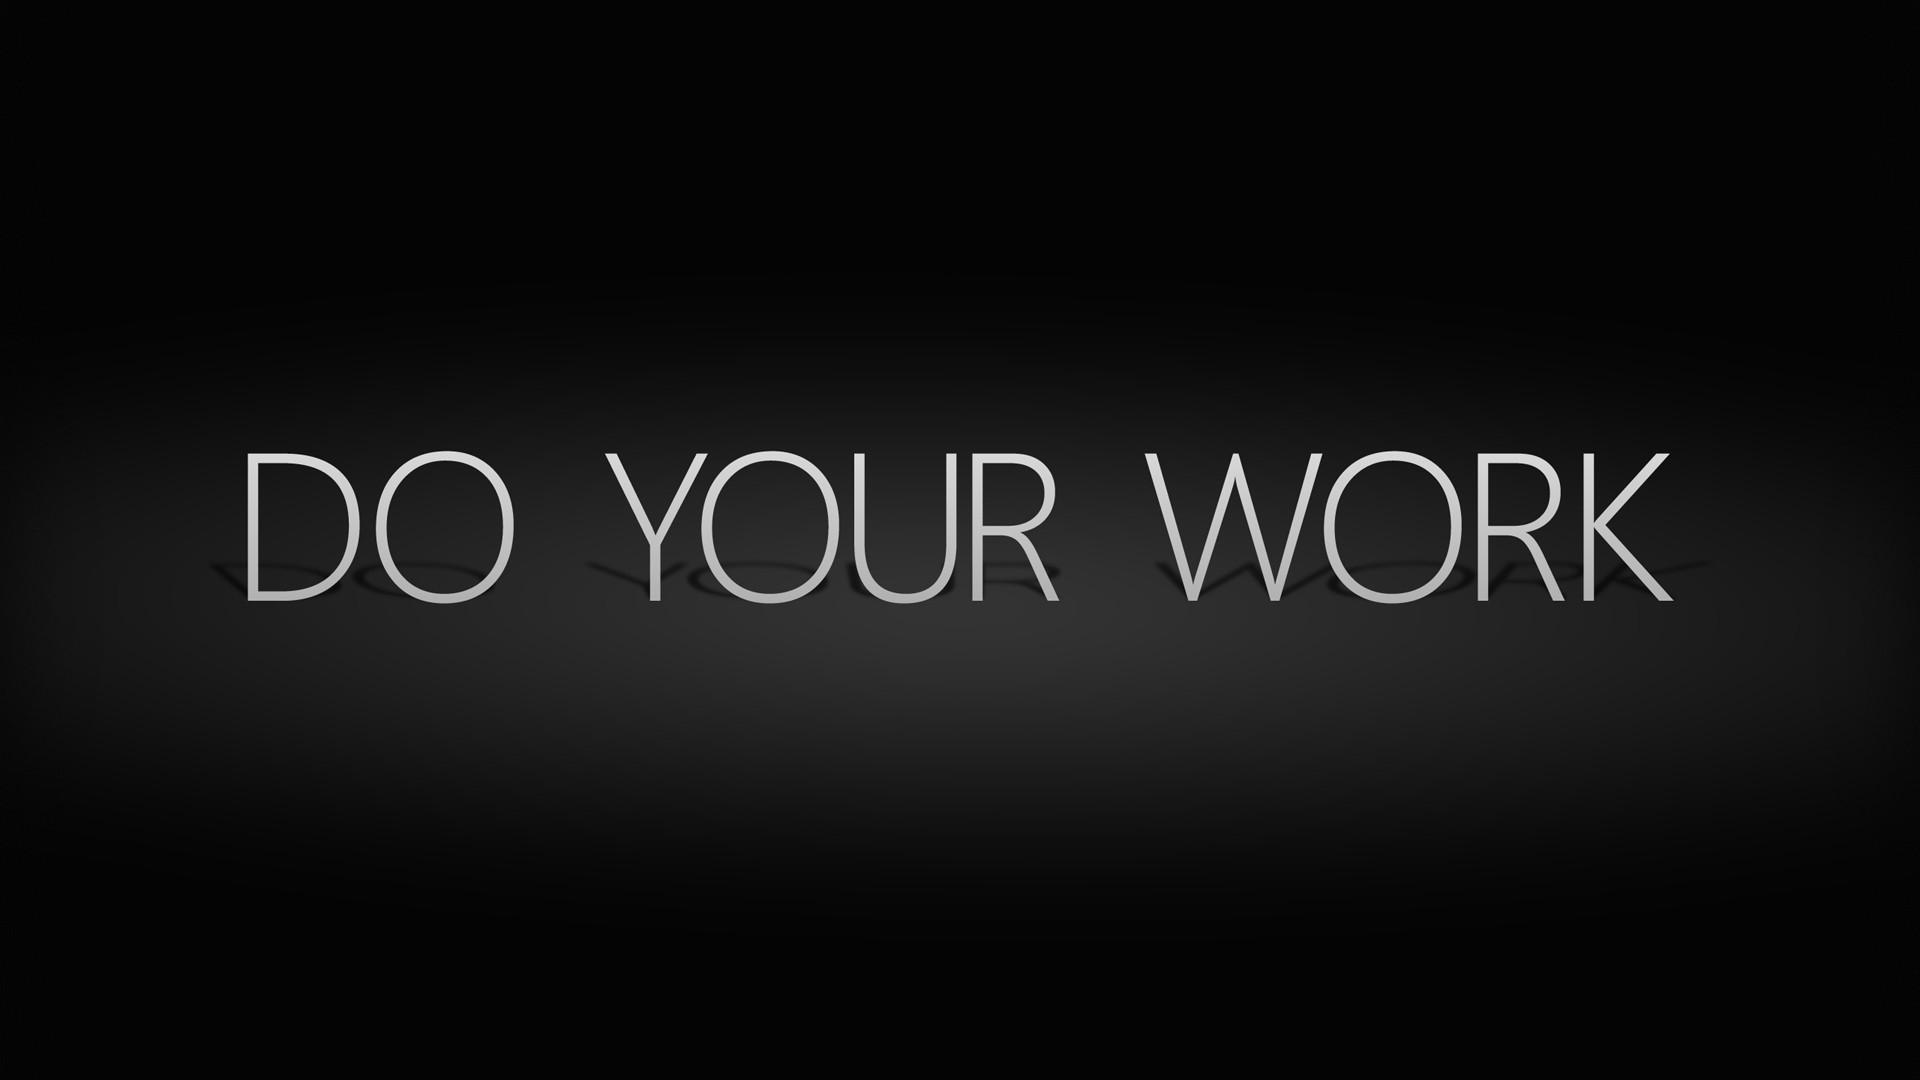 Hình nền đen Do your work